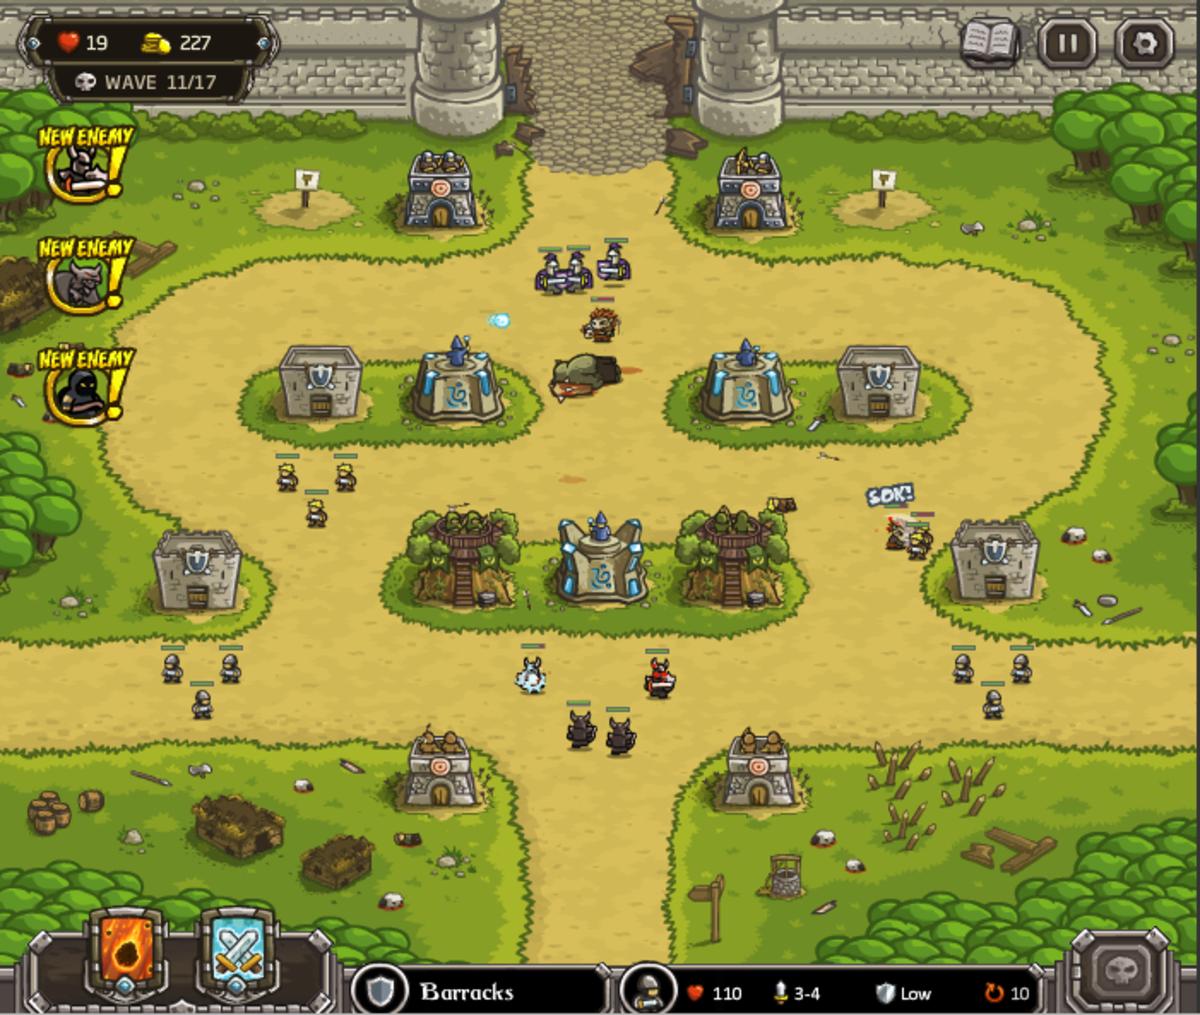 Kingdom Rush Walkthrough: Level 6 - The Citadel